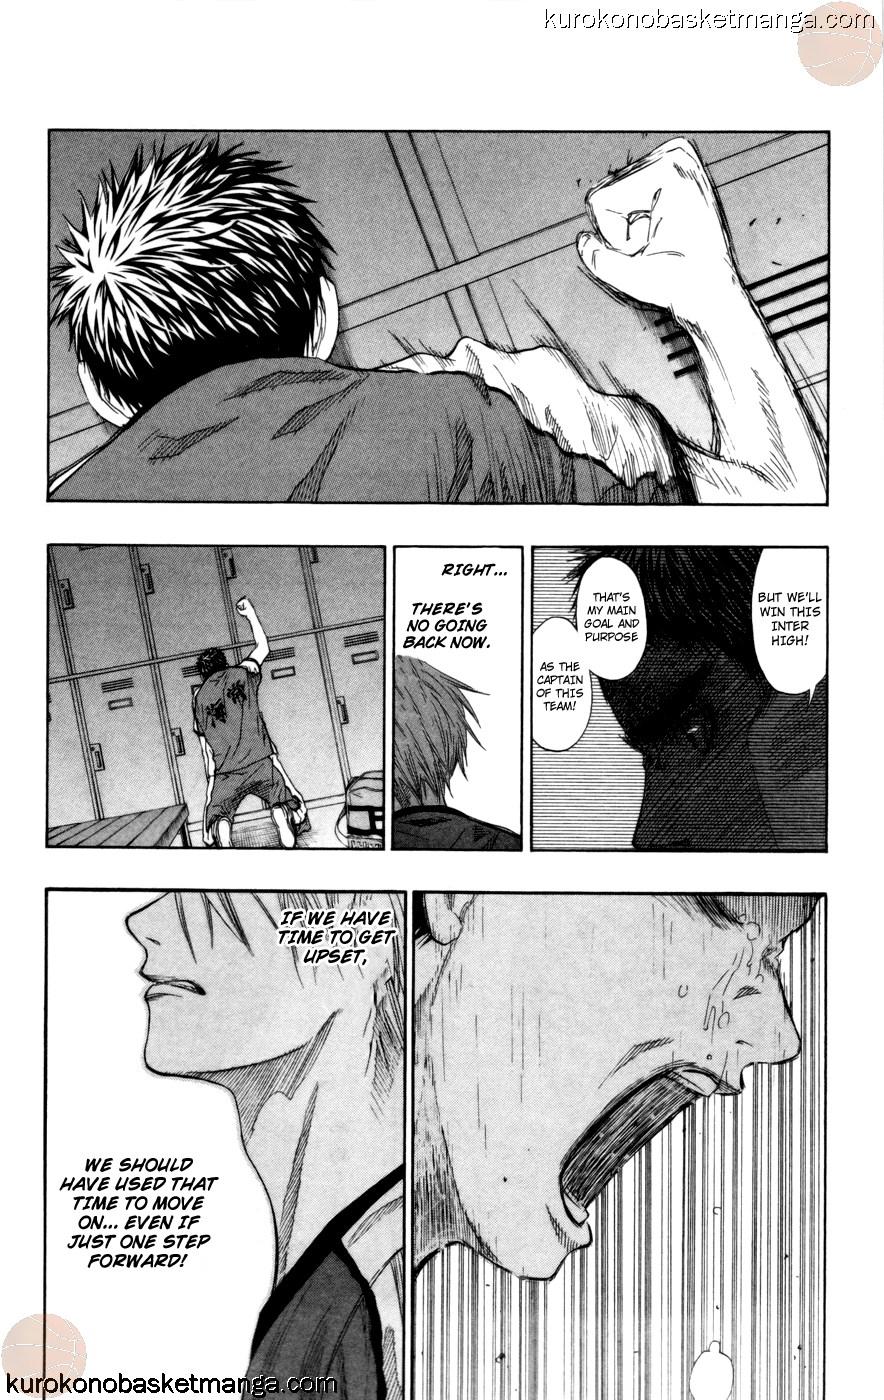 Kuroko no Basket Manga Chapter 73 - Image 14